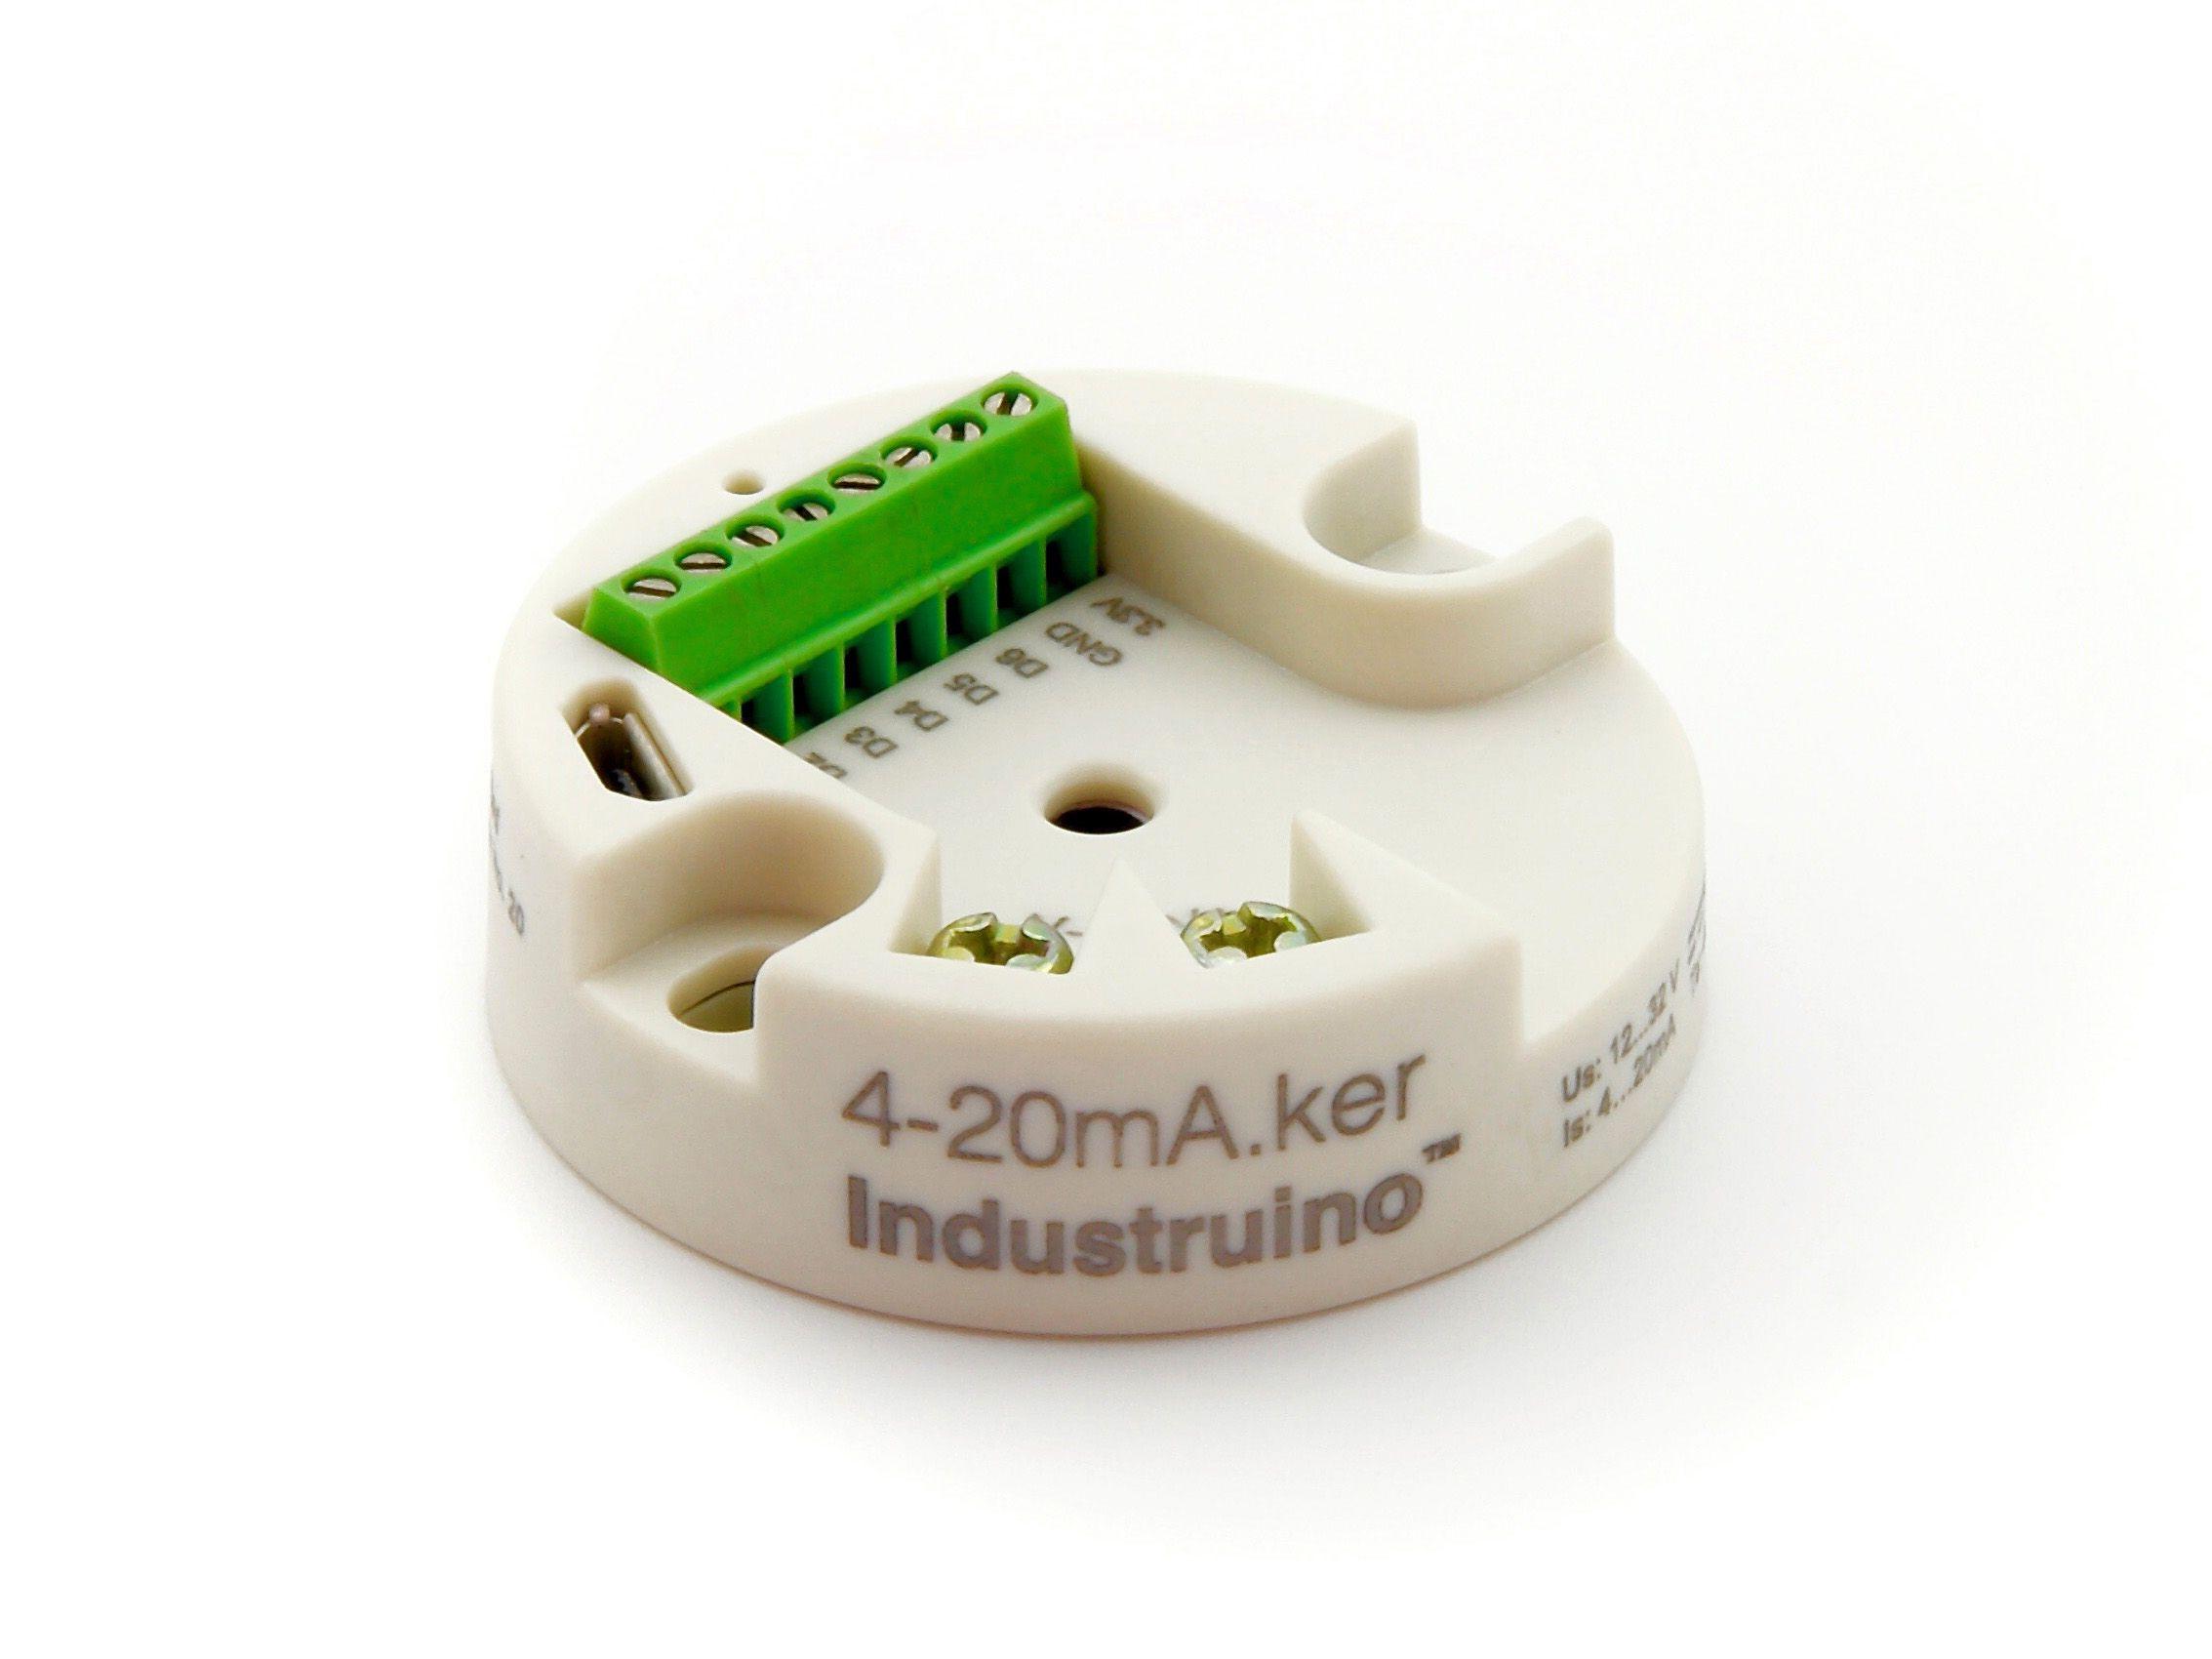 Industruino 4-20mA ker